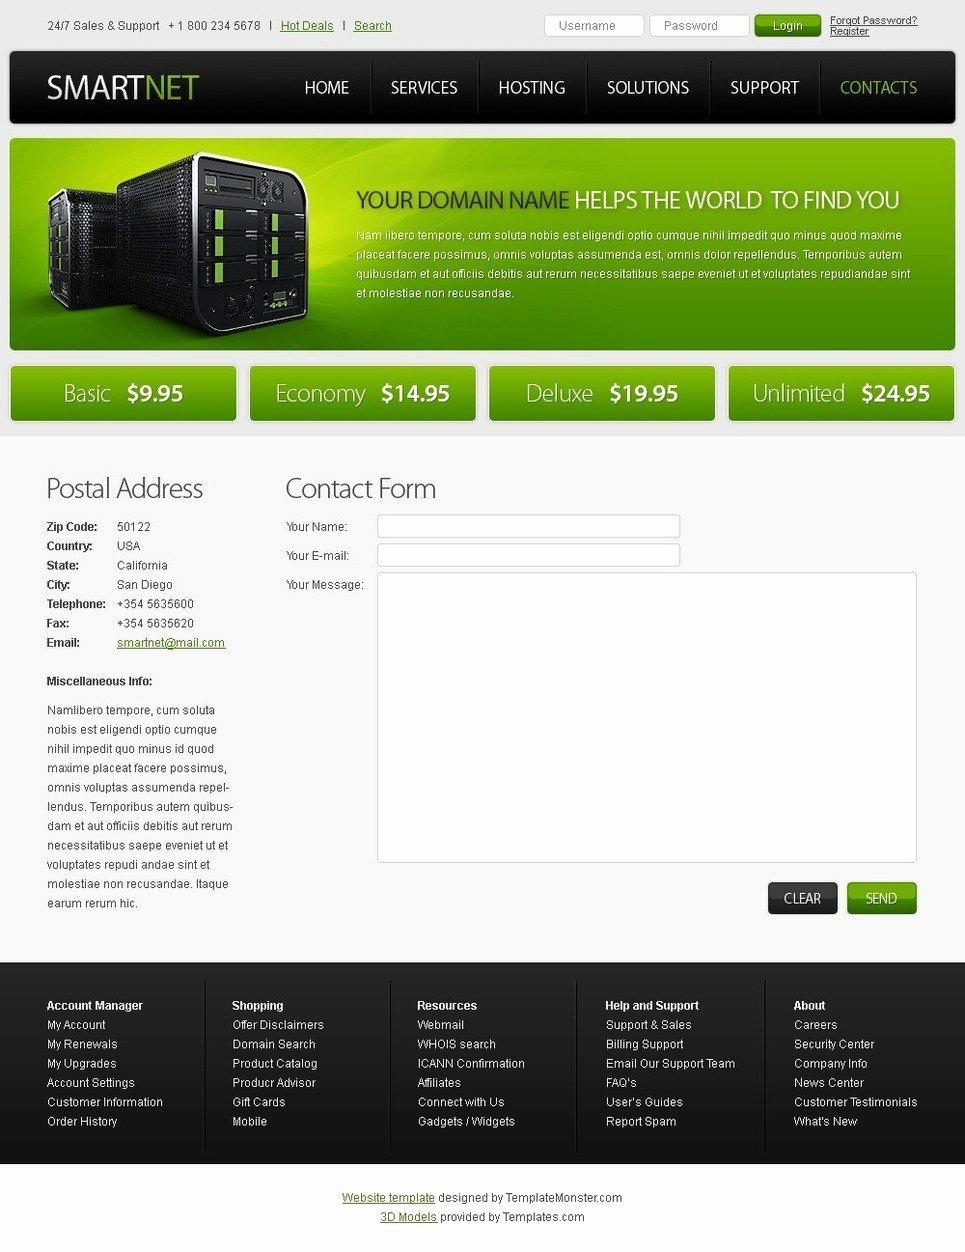 230 Free Responsive HTML5 Css3 Website Templates